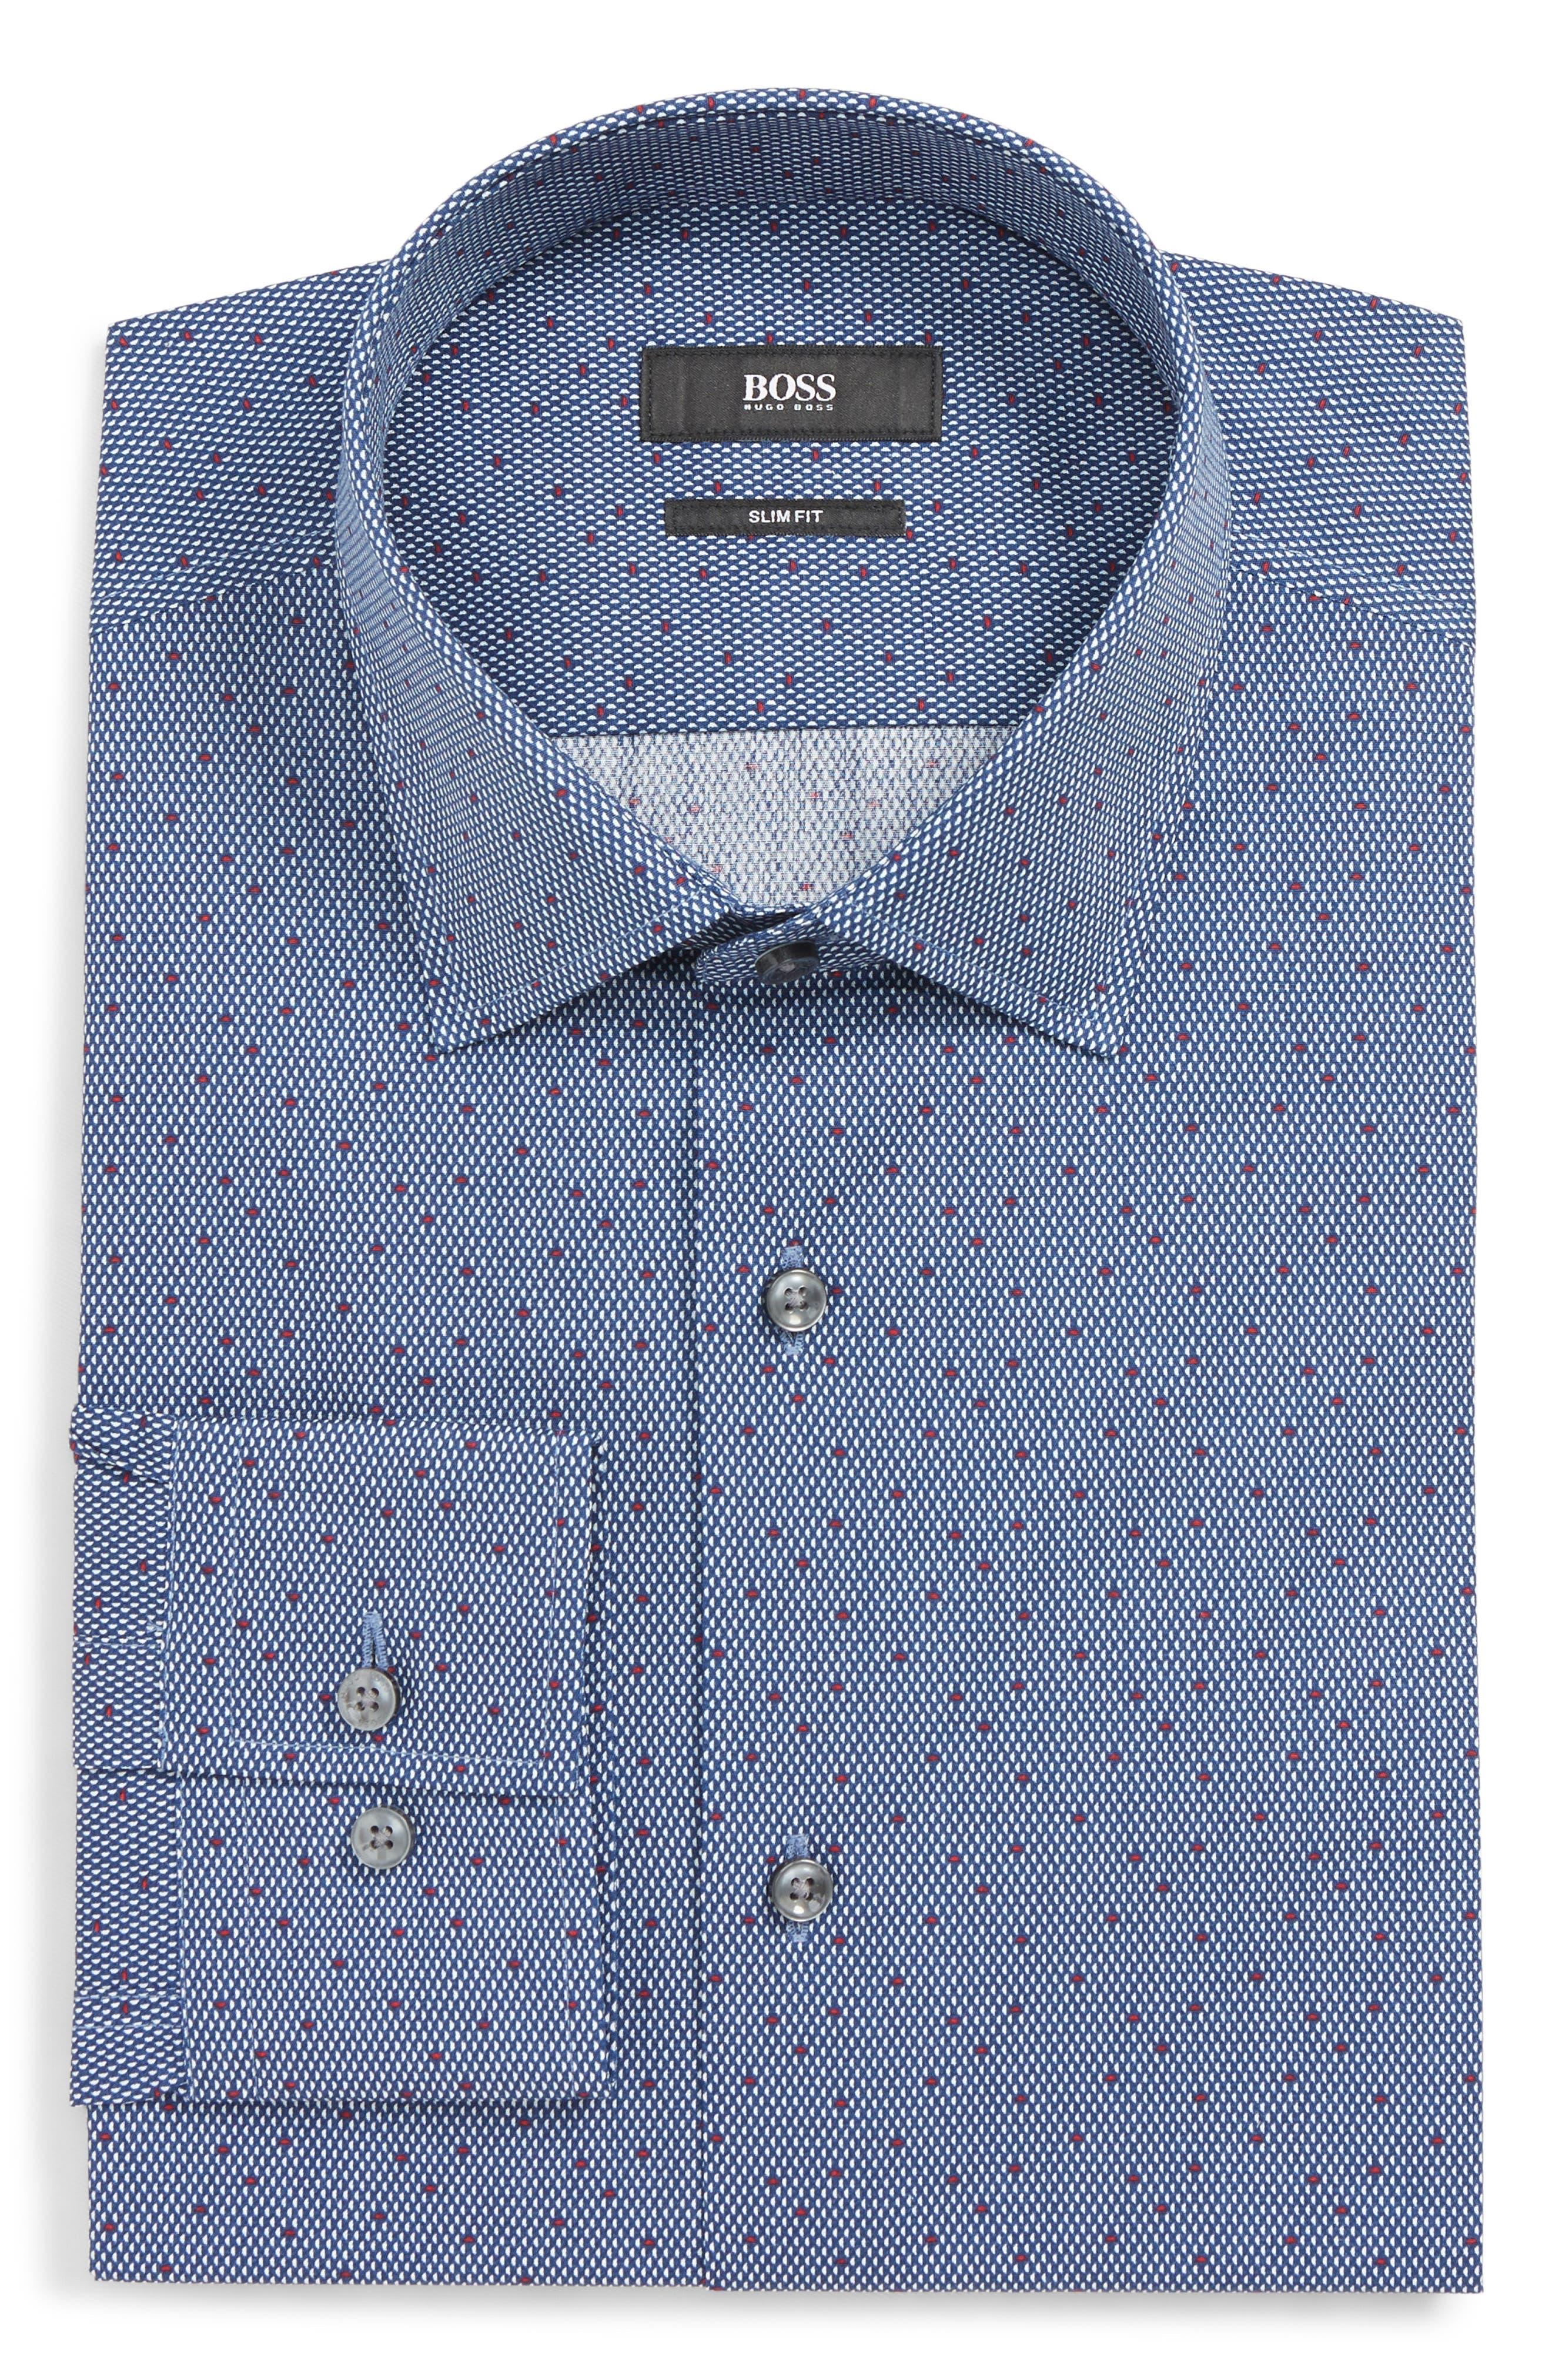 308458dff Men's BOSS Dress Shirts | Nordstrom